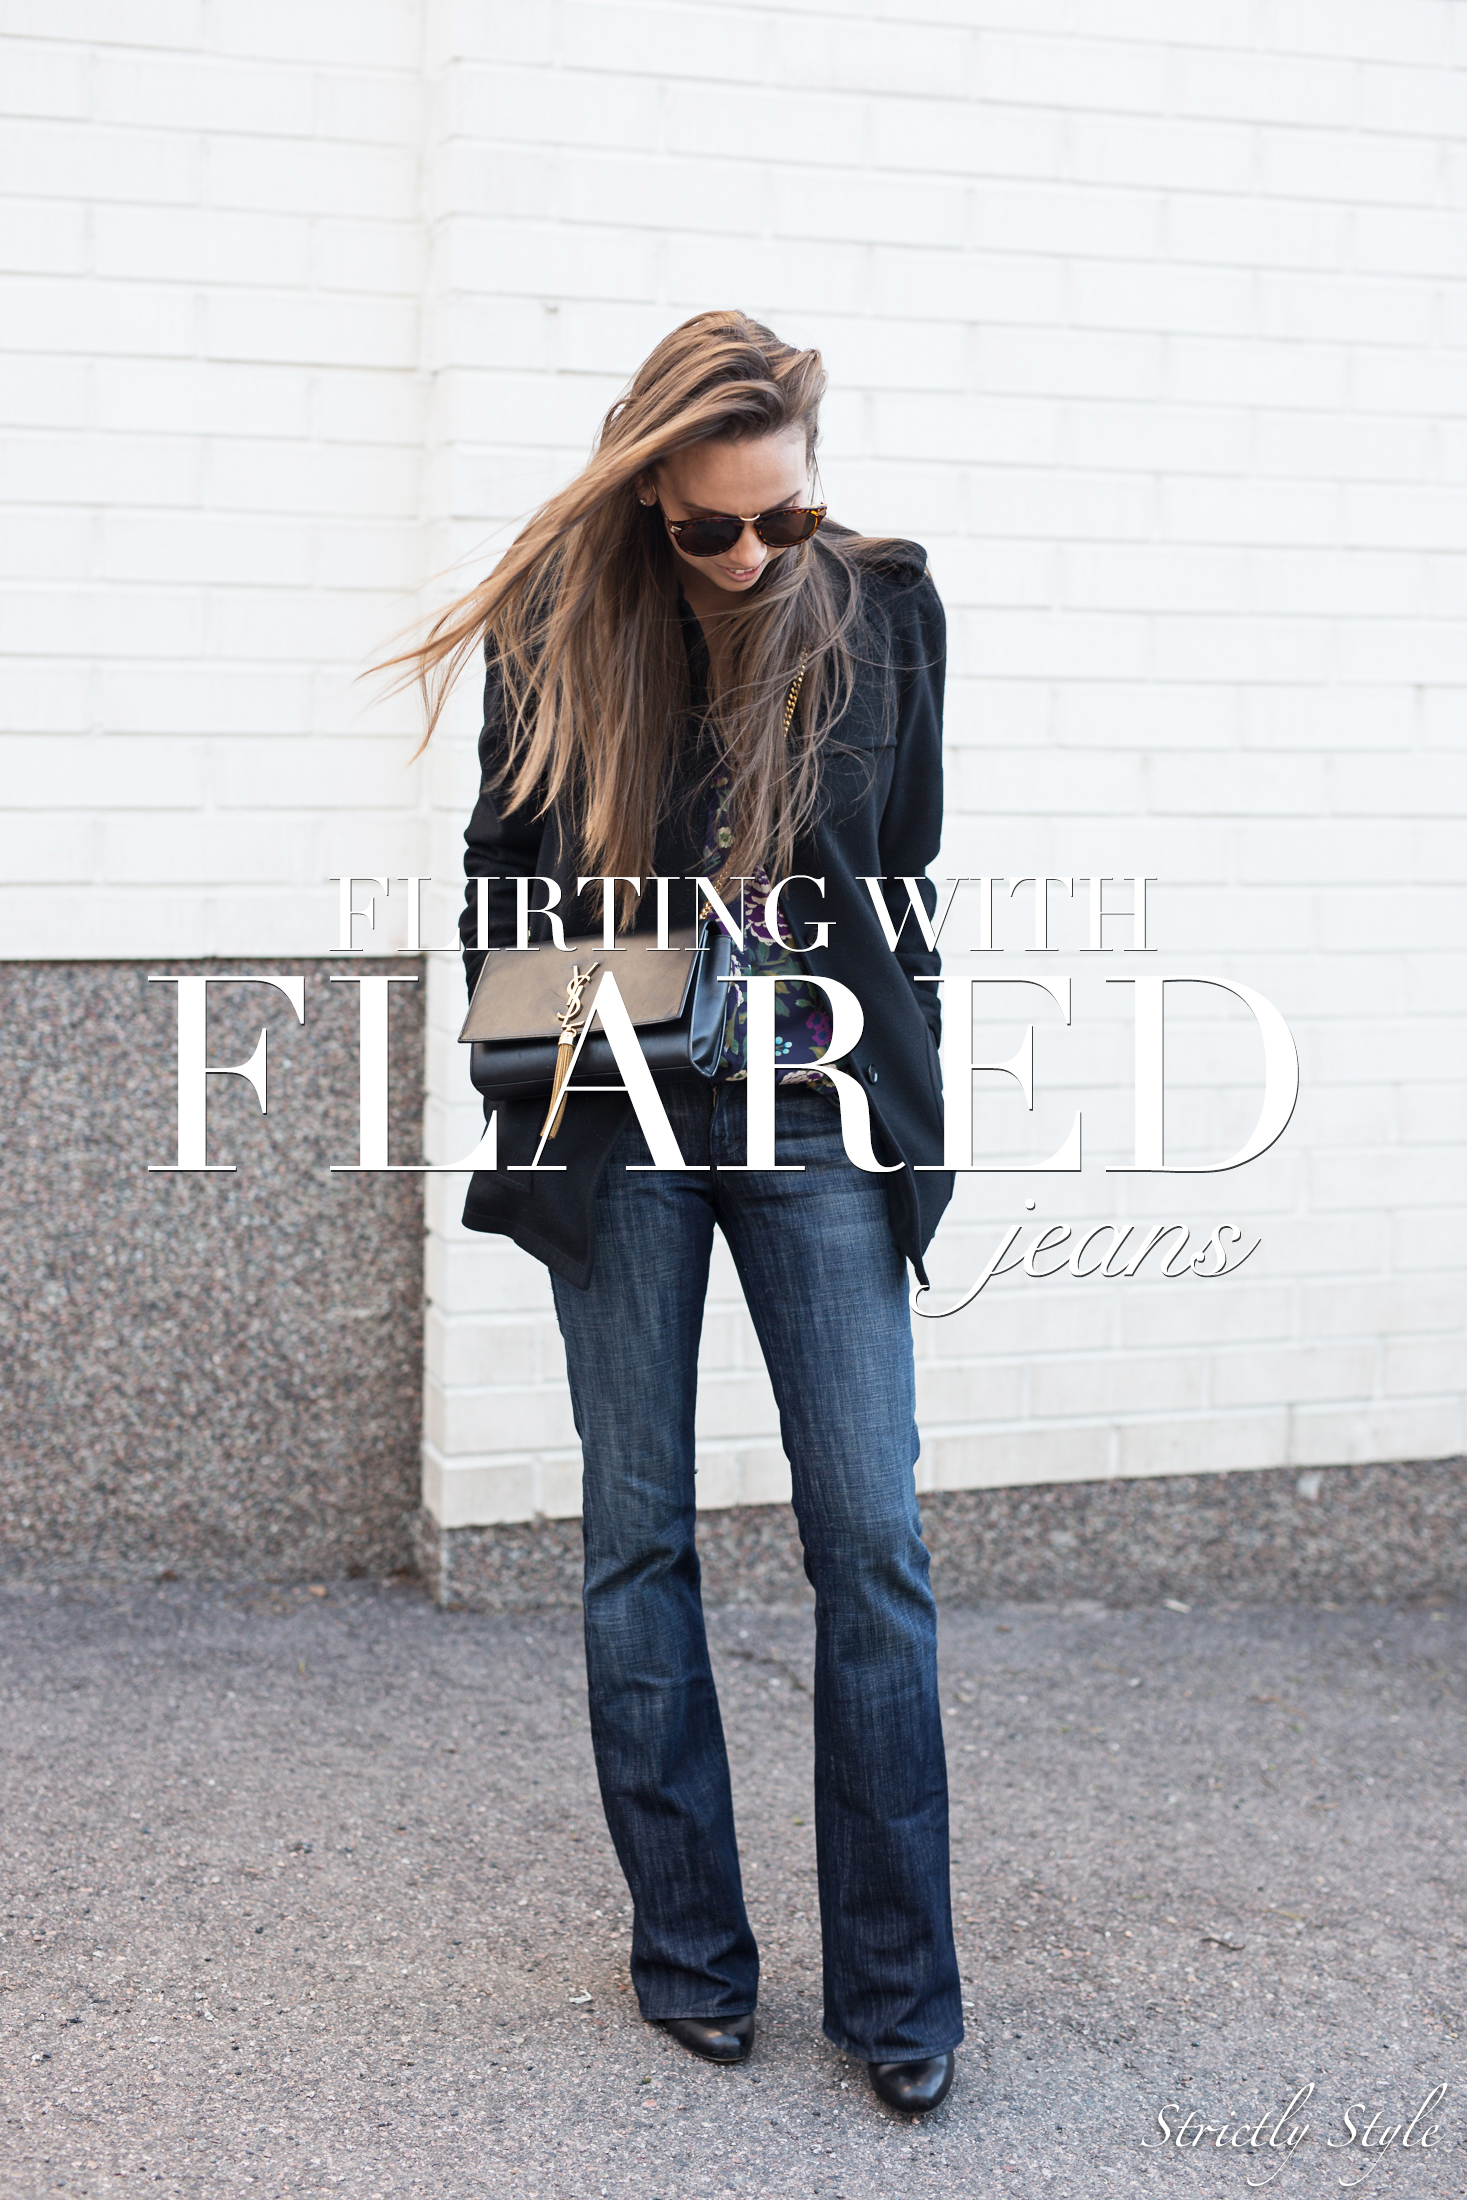 flare flirt-8328text